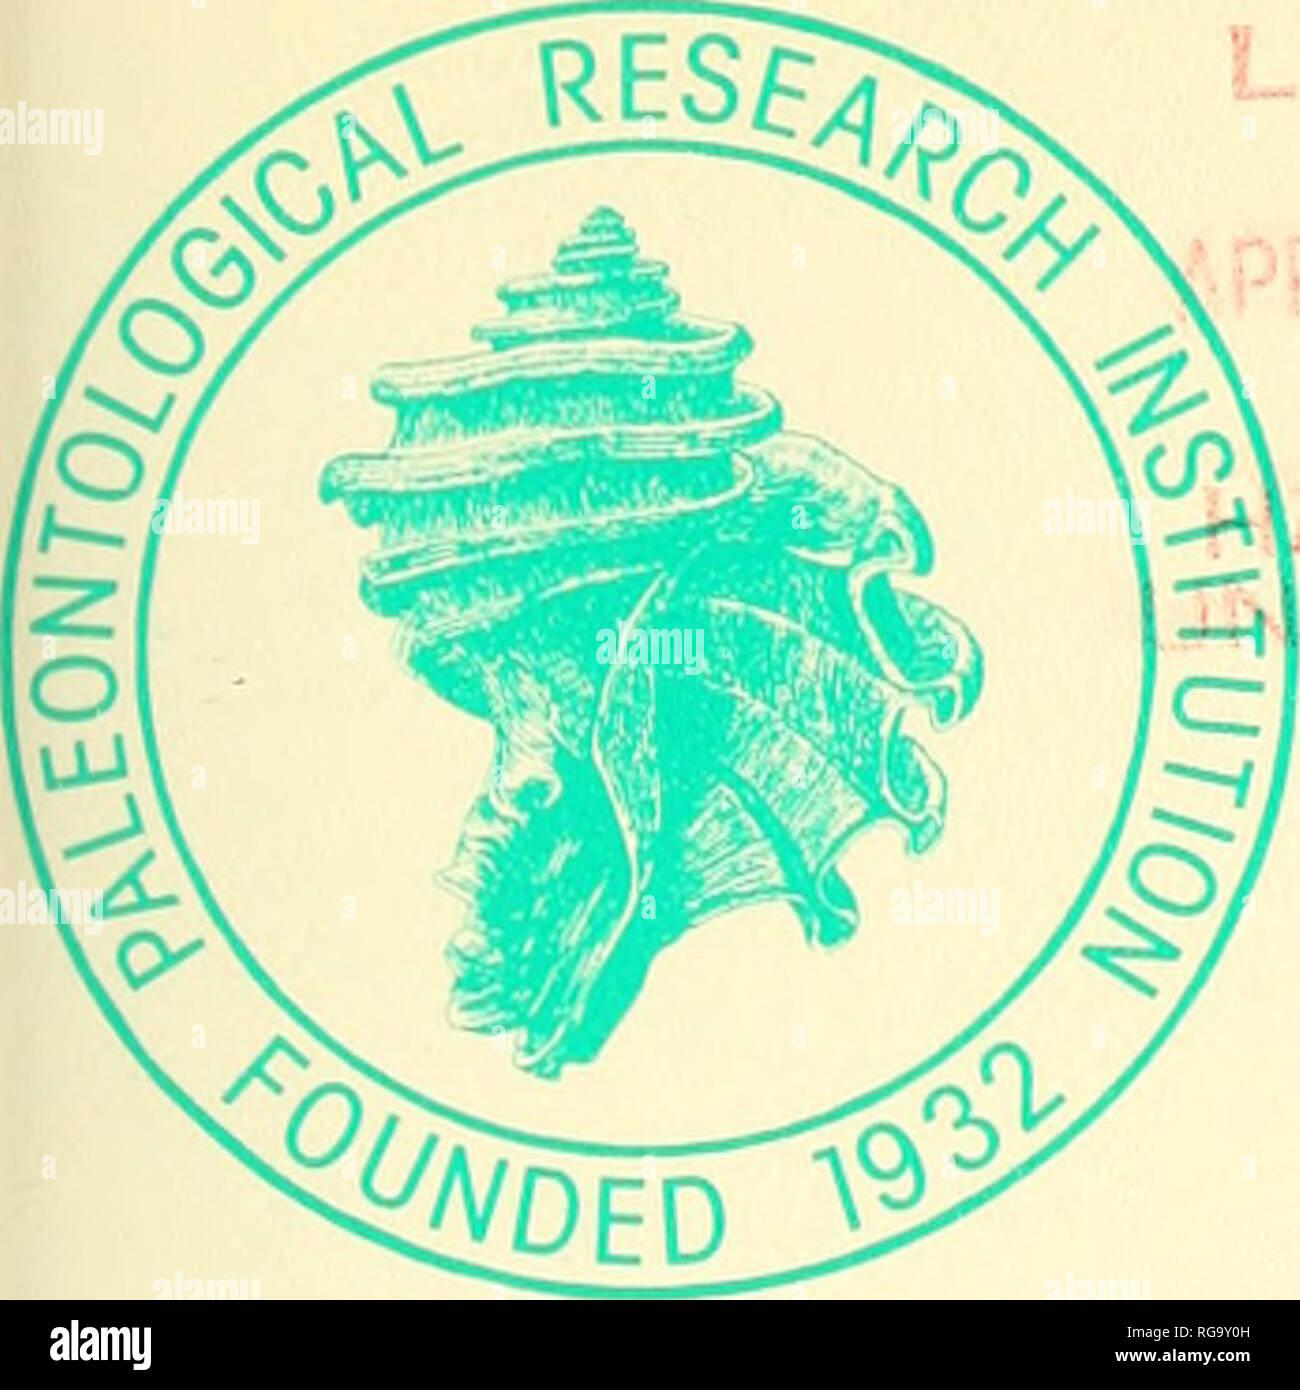 hight resolution of boletines de la paleontolog a americana uiotins de fsmcrican yakon towqs